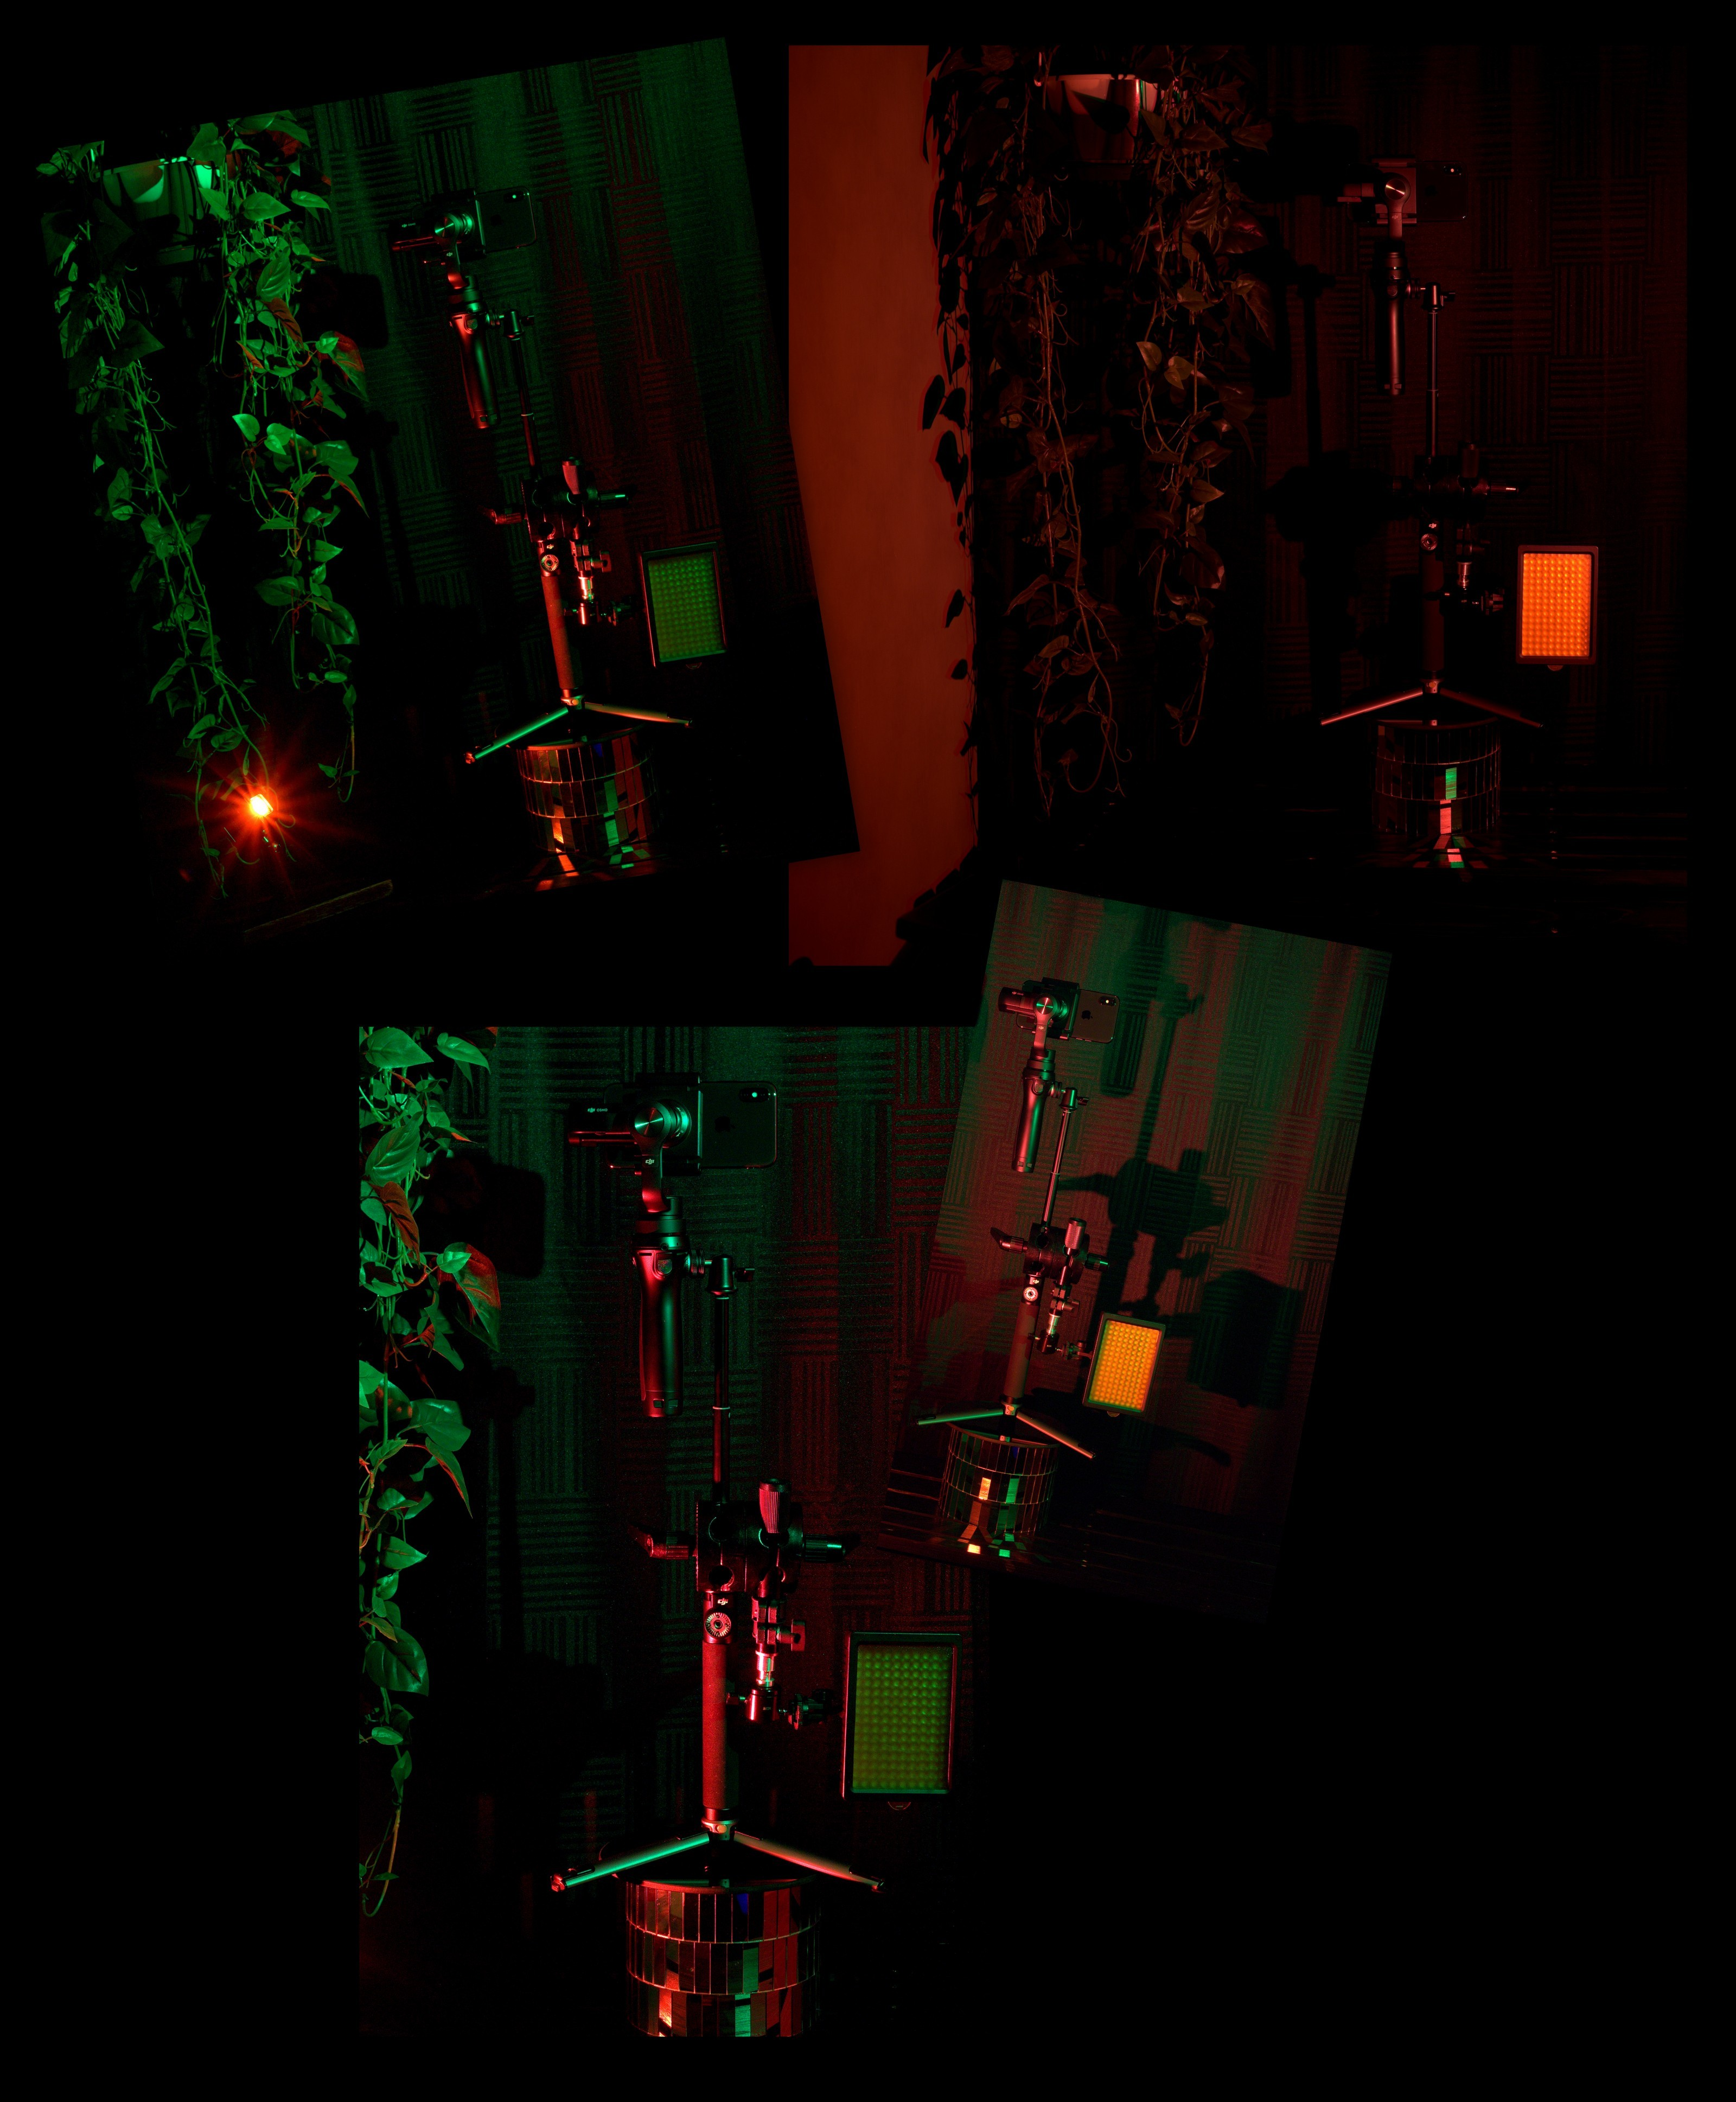 Photography ~ Micro-Lite Cargo-Go Lite Xtreme Trailer [DJI Osmo Mobile Still Life], 07/15